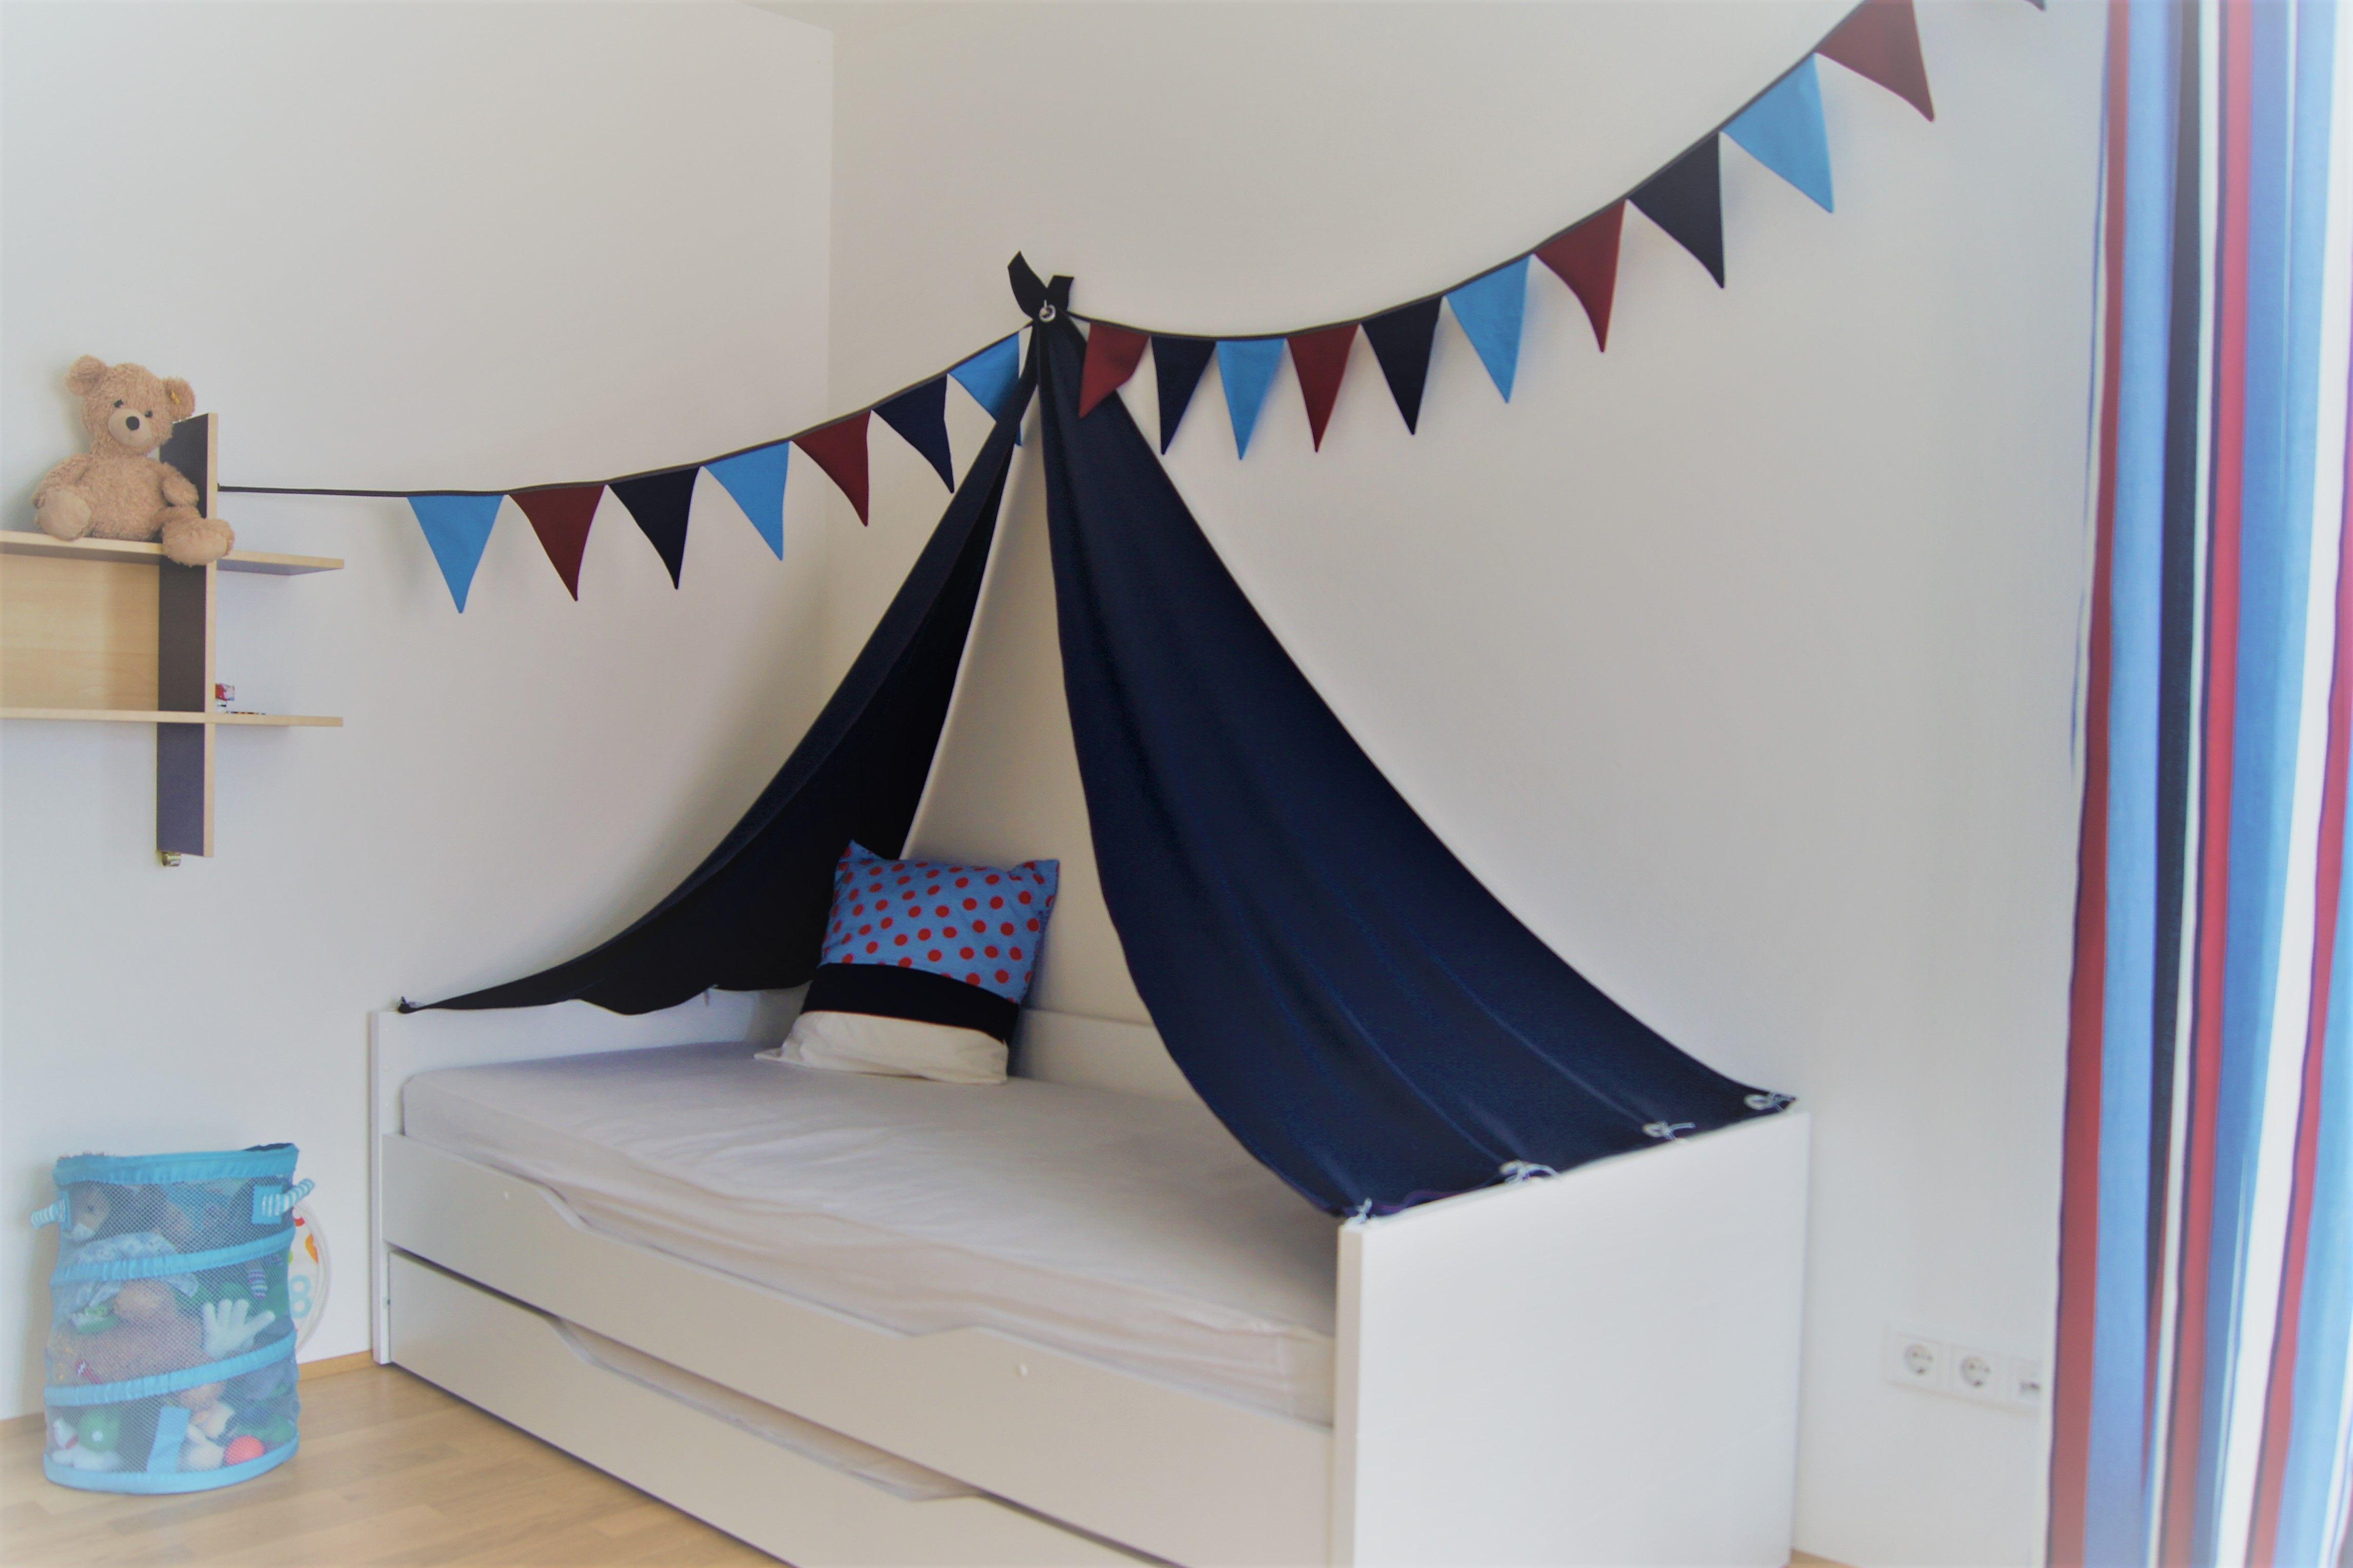 Kinderzimmer Bettzelt Mit Wimpelkette Kinder Zimmer Zelt